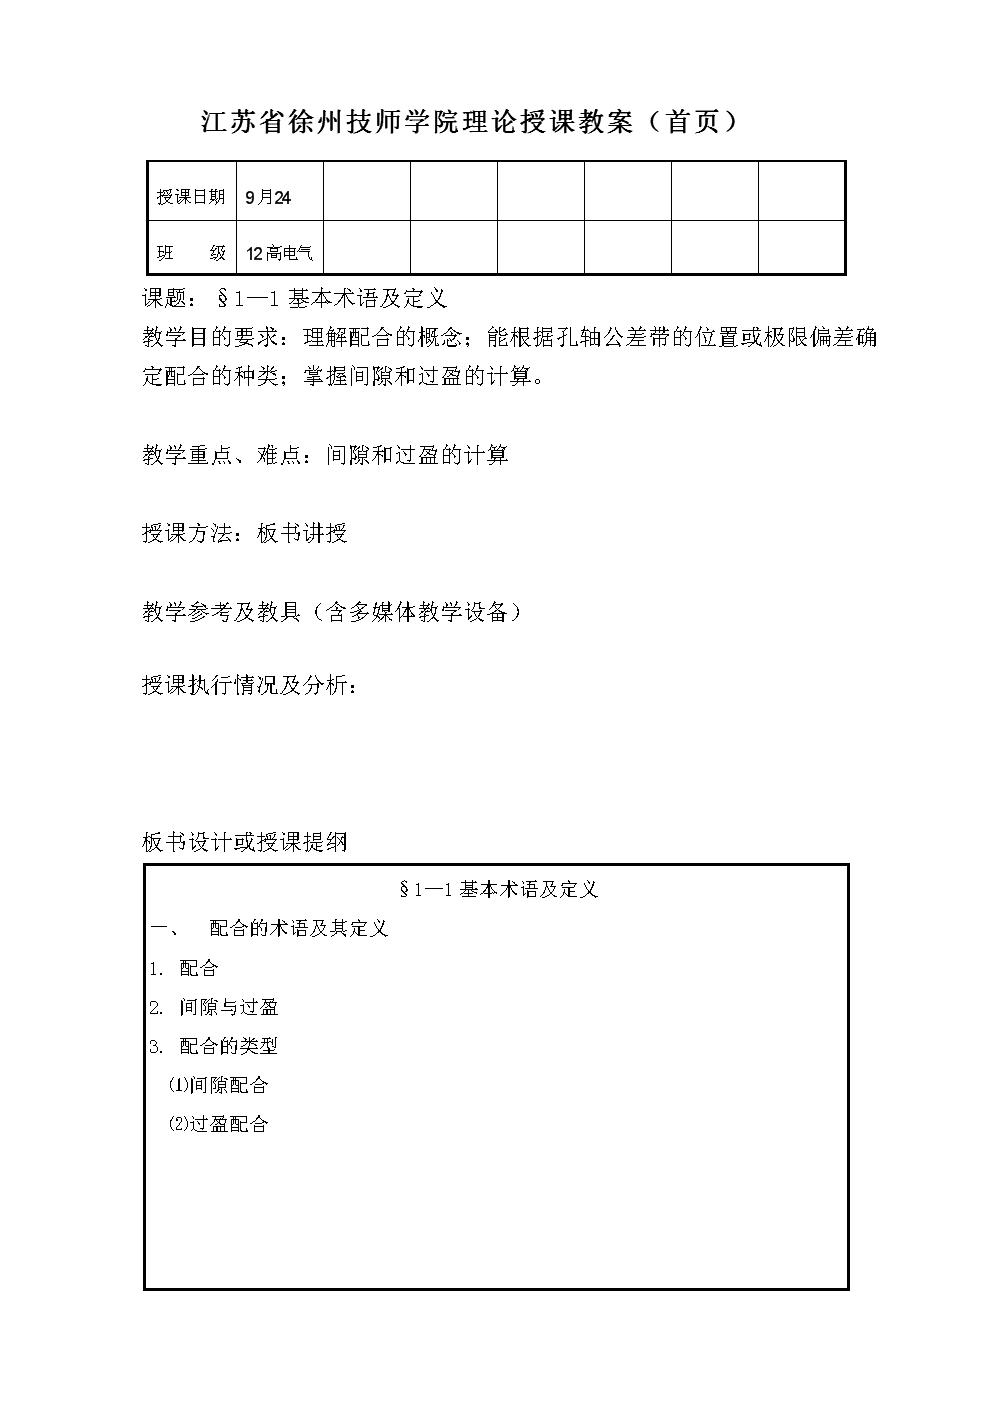 XJSD-0504-22理论课教案(不印刷).doc